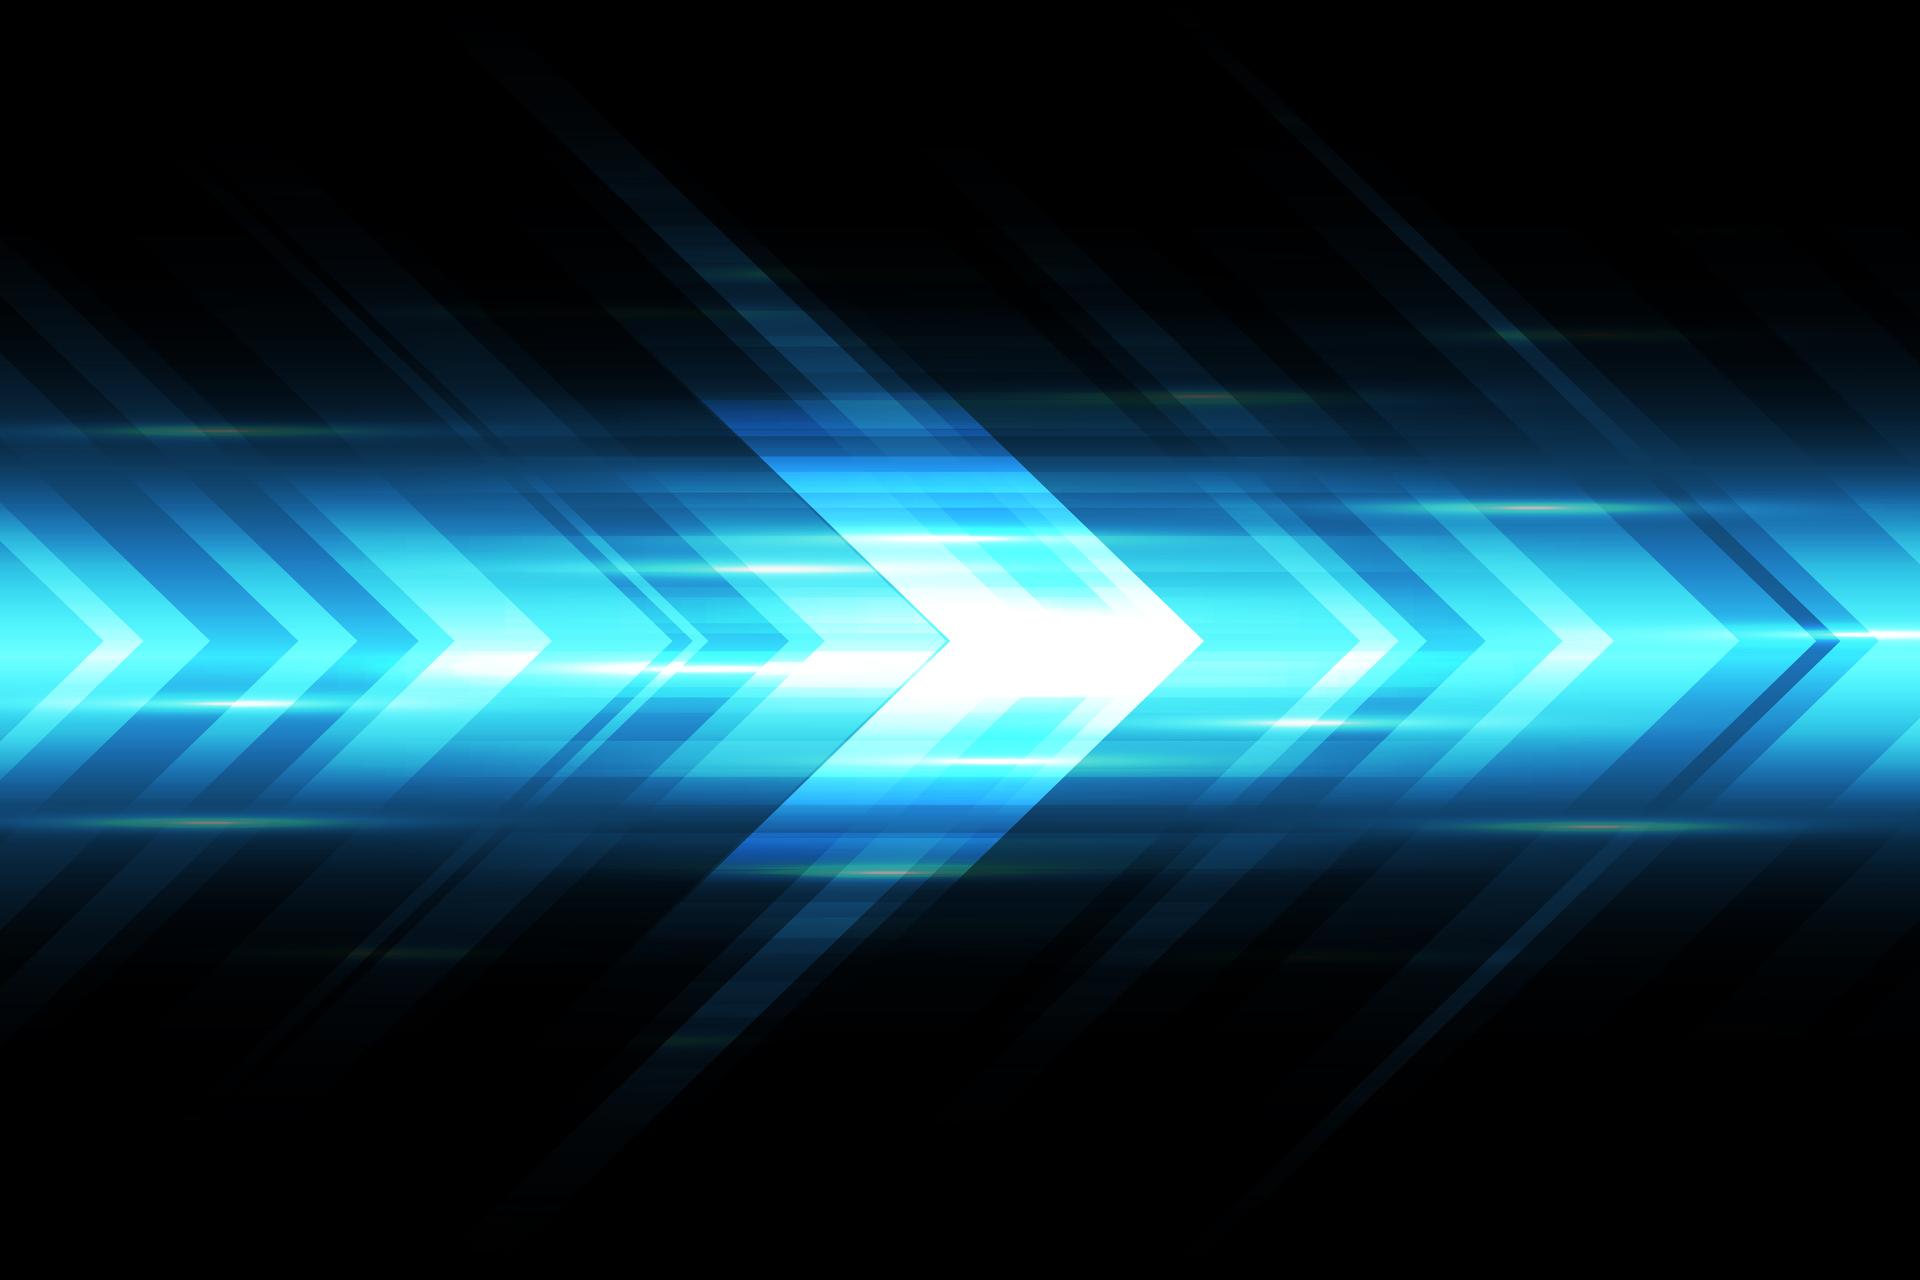 Abstract blue light arrow speed power technology futuristic background vector illustration